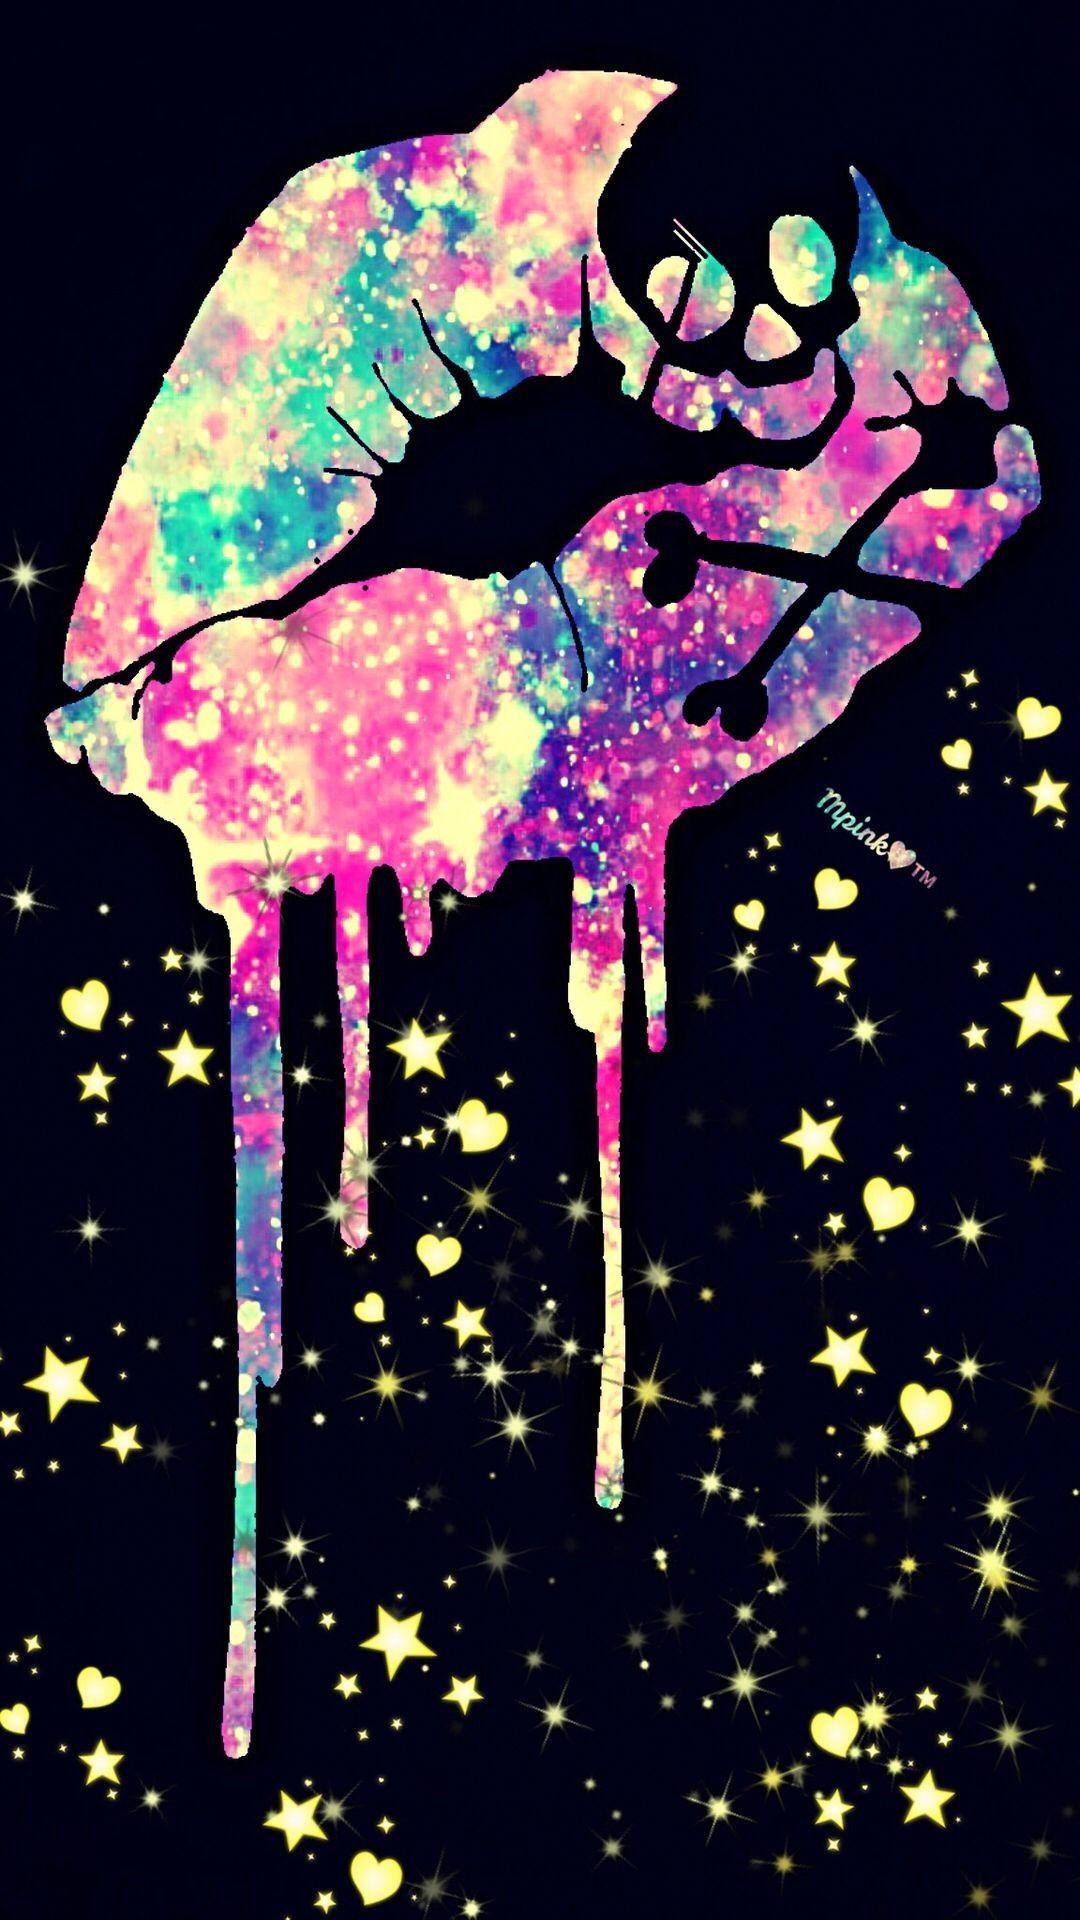 Pin By Mistica Abril On Soleil Et Pluie Skull Wallpaper Galaxy Wallpaper Art